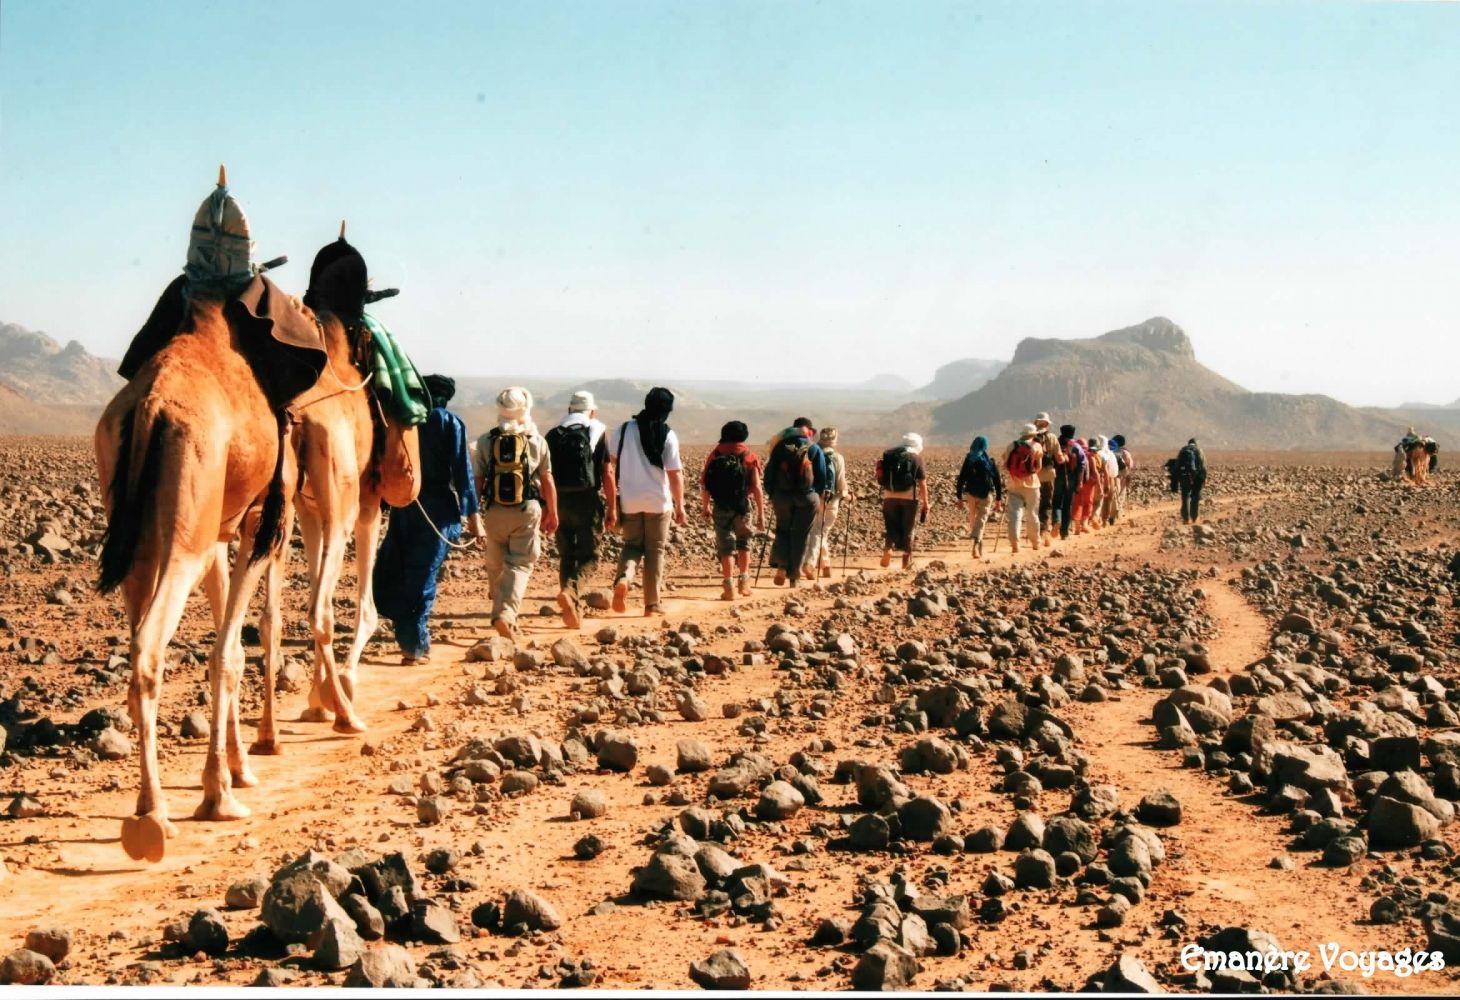 Caravane_Assekrem_Hoggar_Sahara_desert_Algerie.jpg